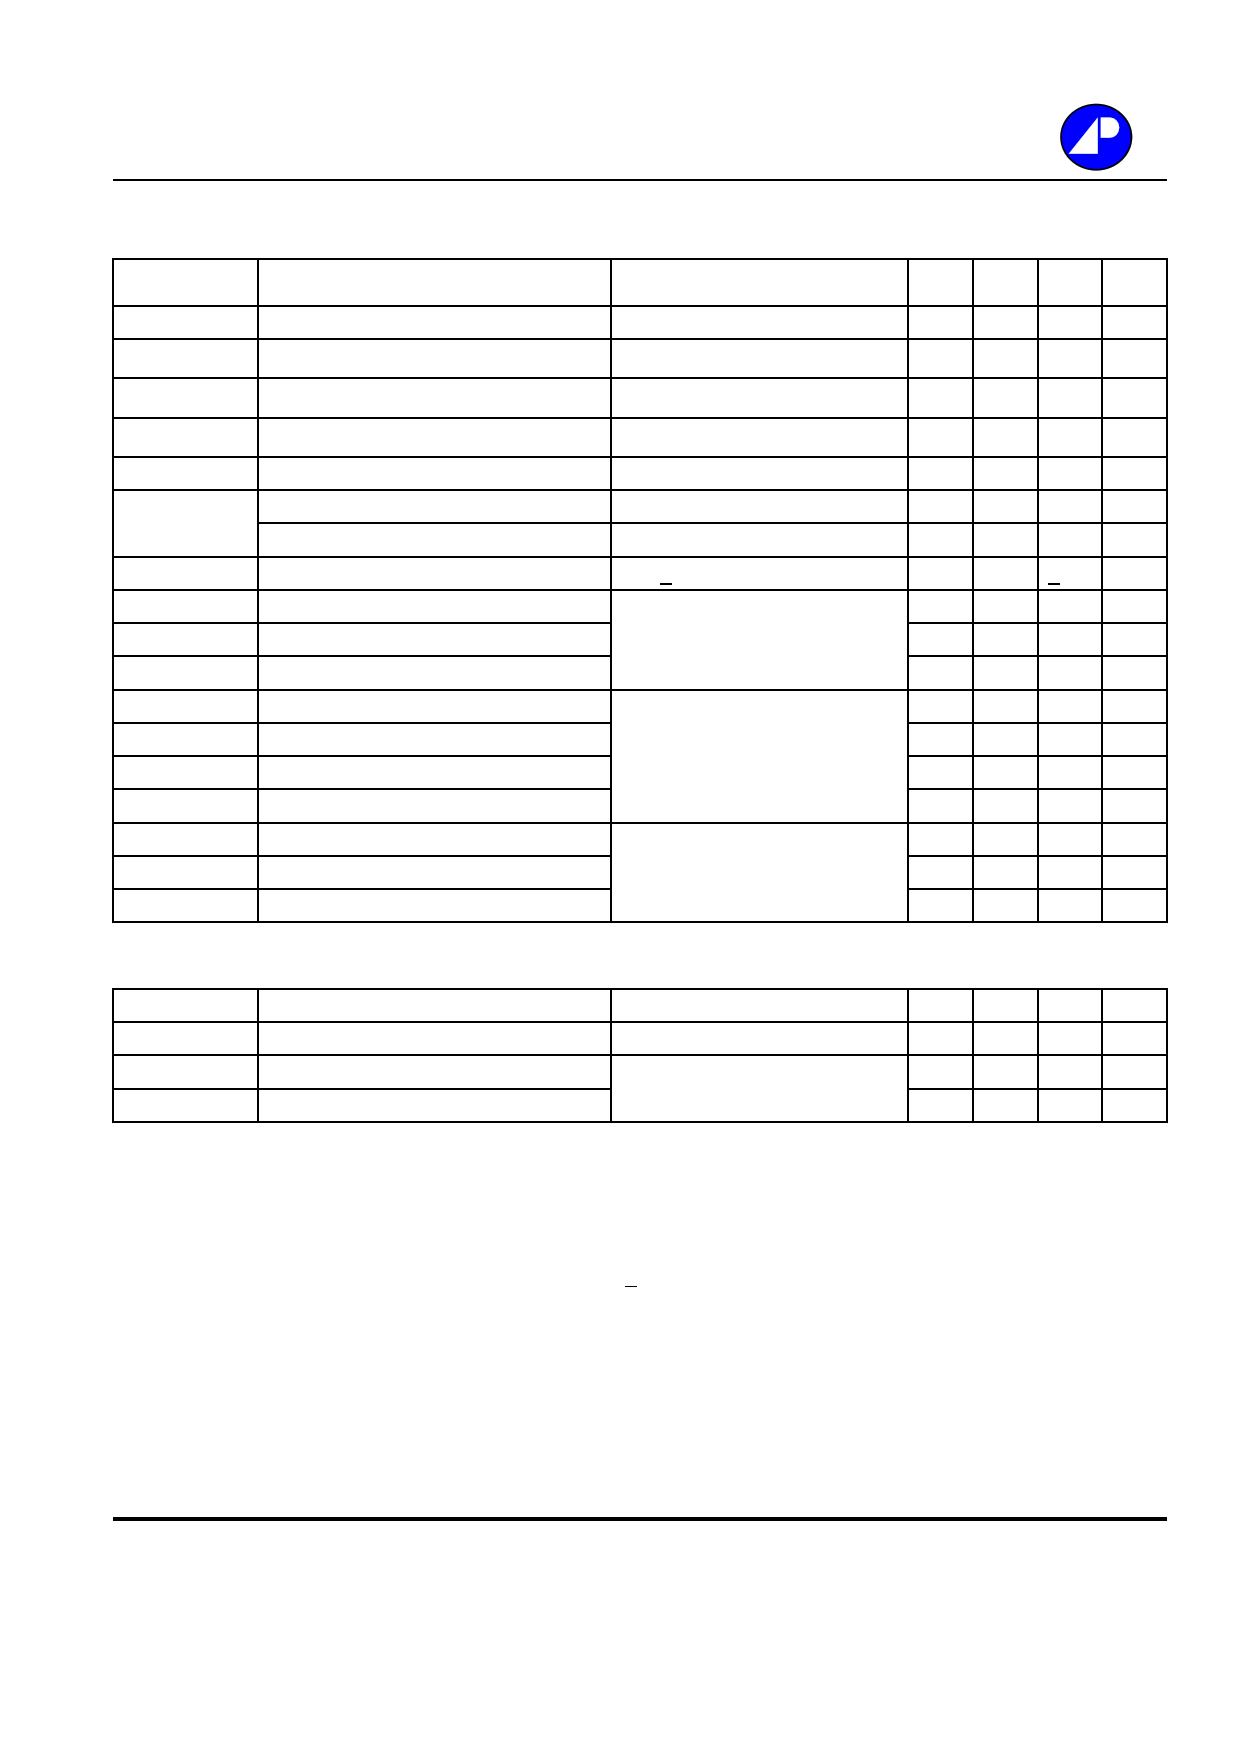 4435GM-HF pdf, schematic